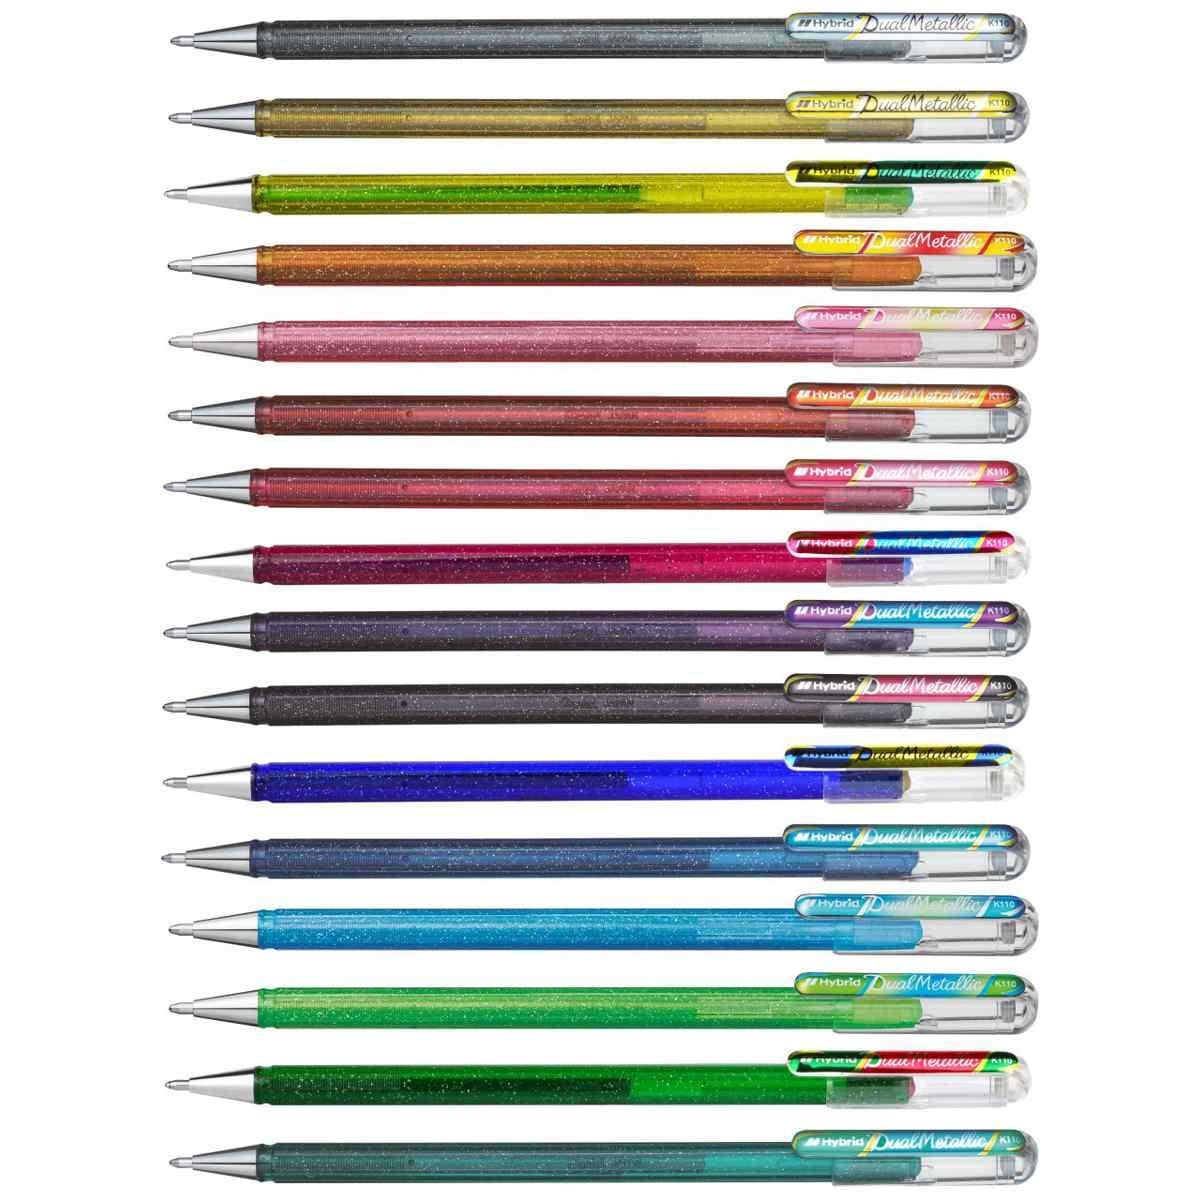 12pcs -Licht Rosa//Grun /& Gold Pentel Hybrid Dual Metallic K110 1.0mm Gel Stift